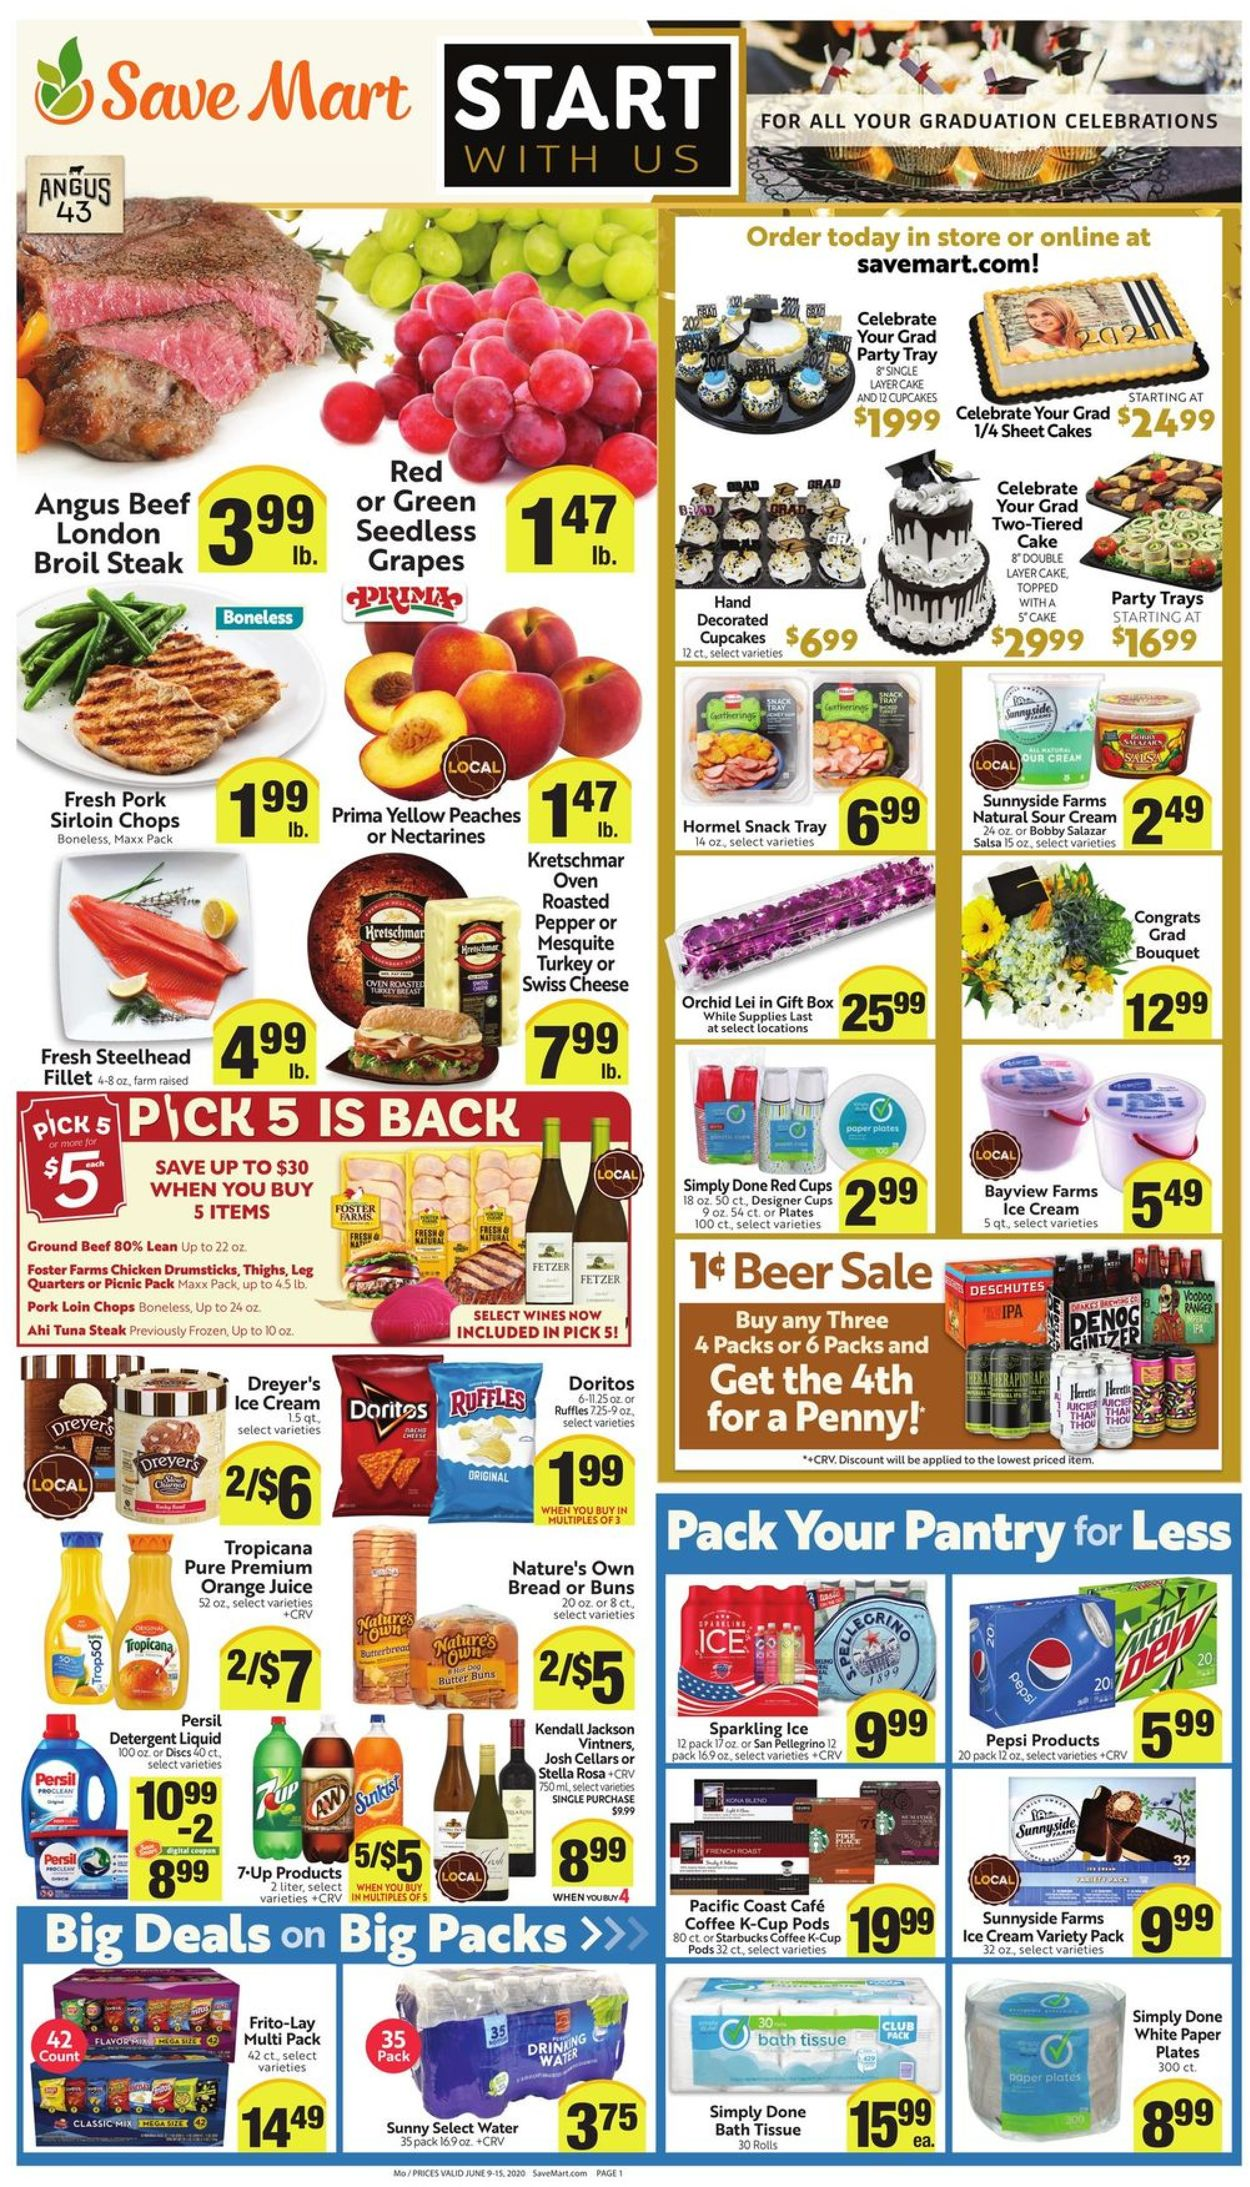 Save Mart Weekly Ad Circular - valid 06/09-06/15/2021